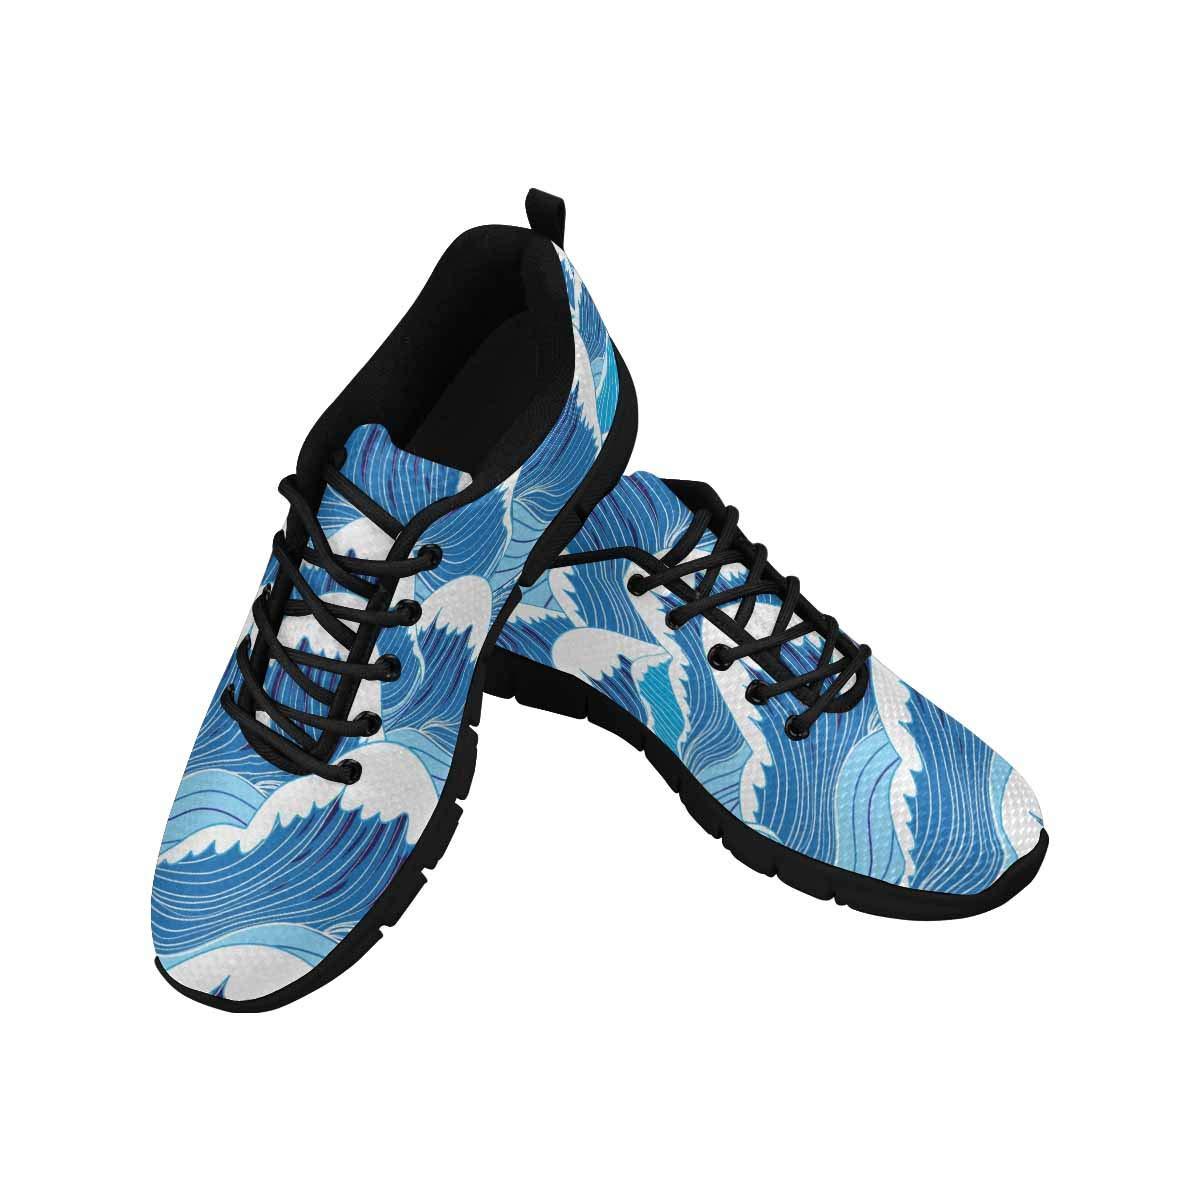 InterestPrint Women's Mesh Cloth Sneakers Lightweight Sport Shoes Ocean Sea Waves